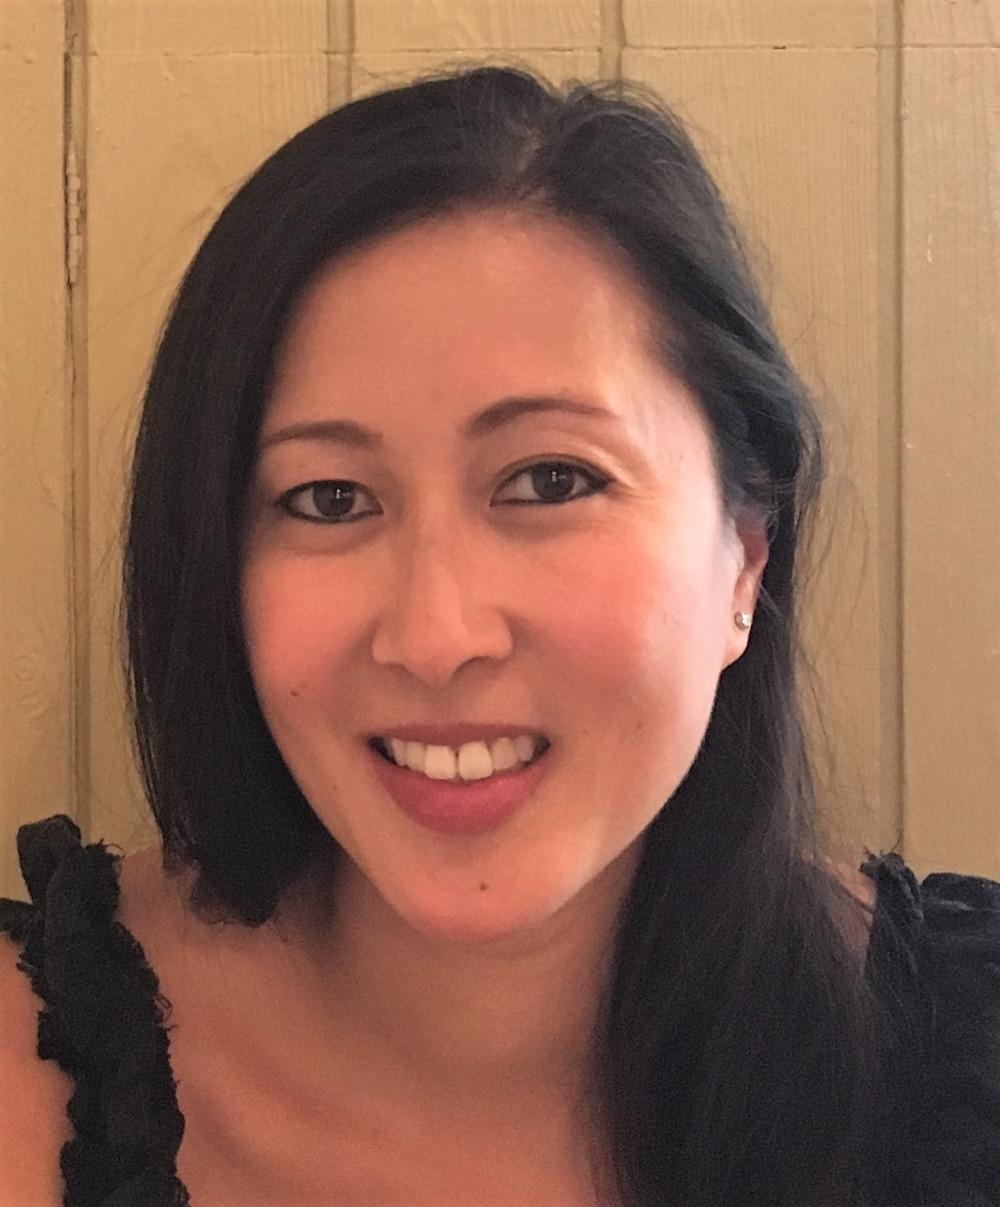 Zora Chung, Co-Founder & CFO, ReJoule